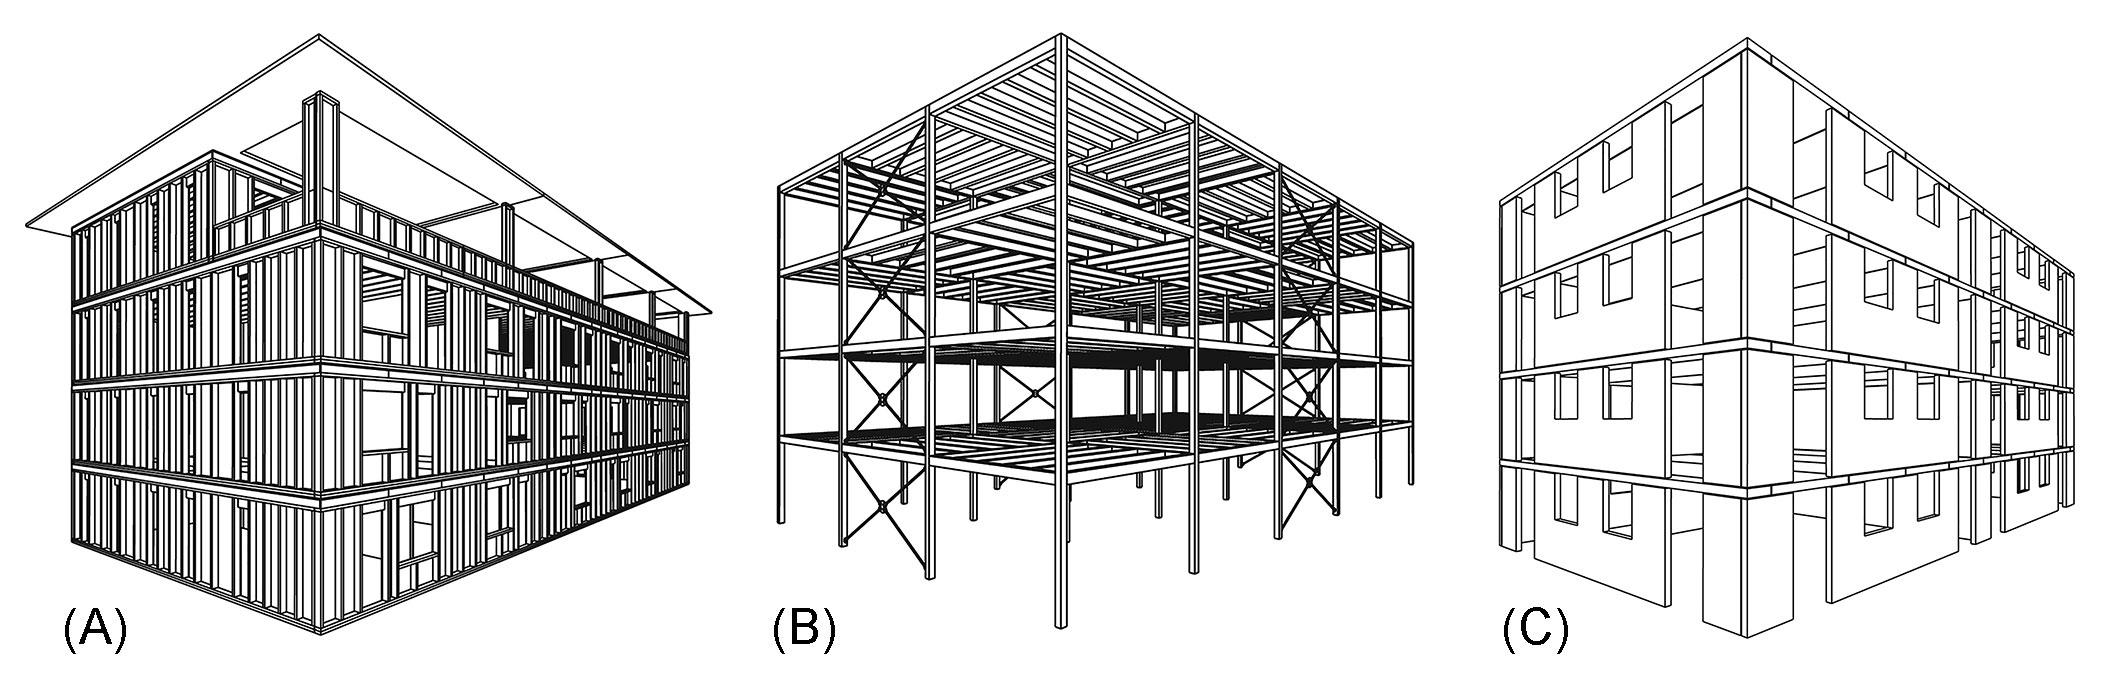 Kitek Kuzman M, Sandberg D (2017). Comparison of timber-house ...